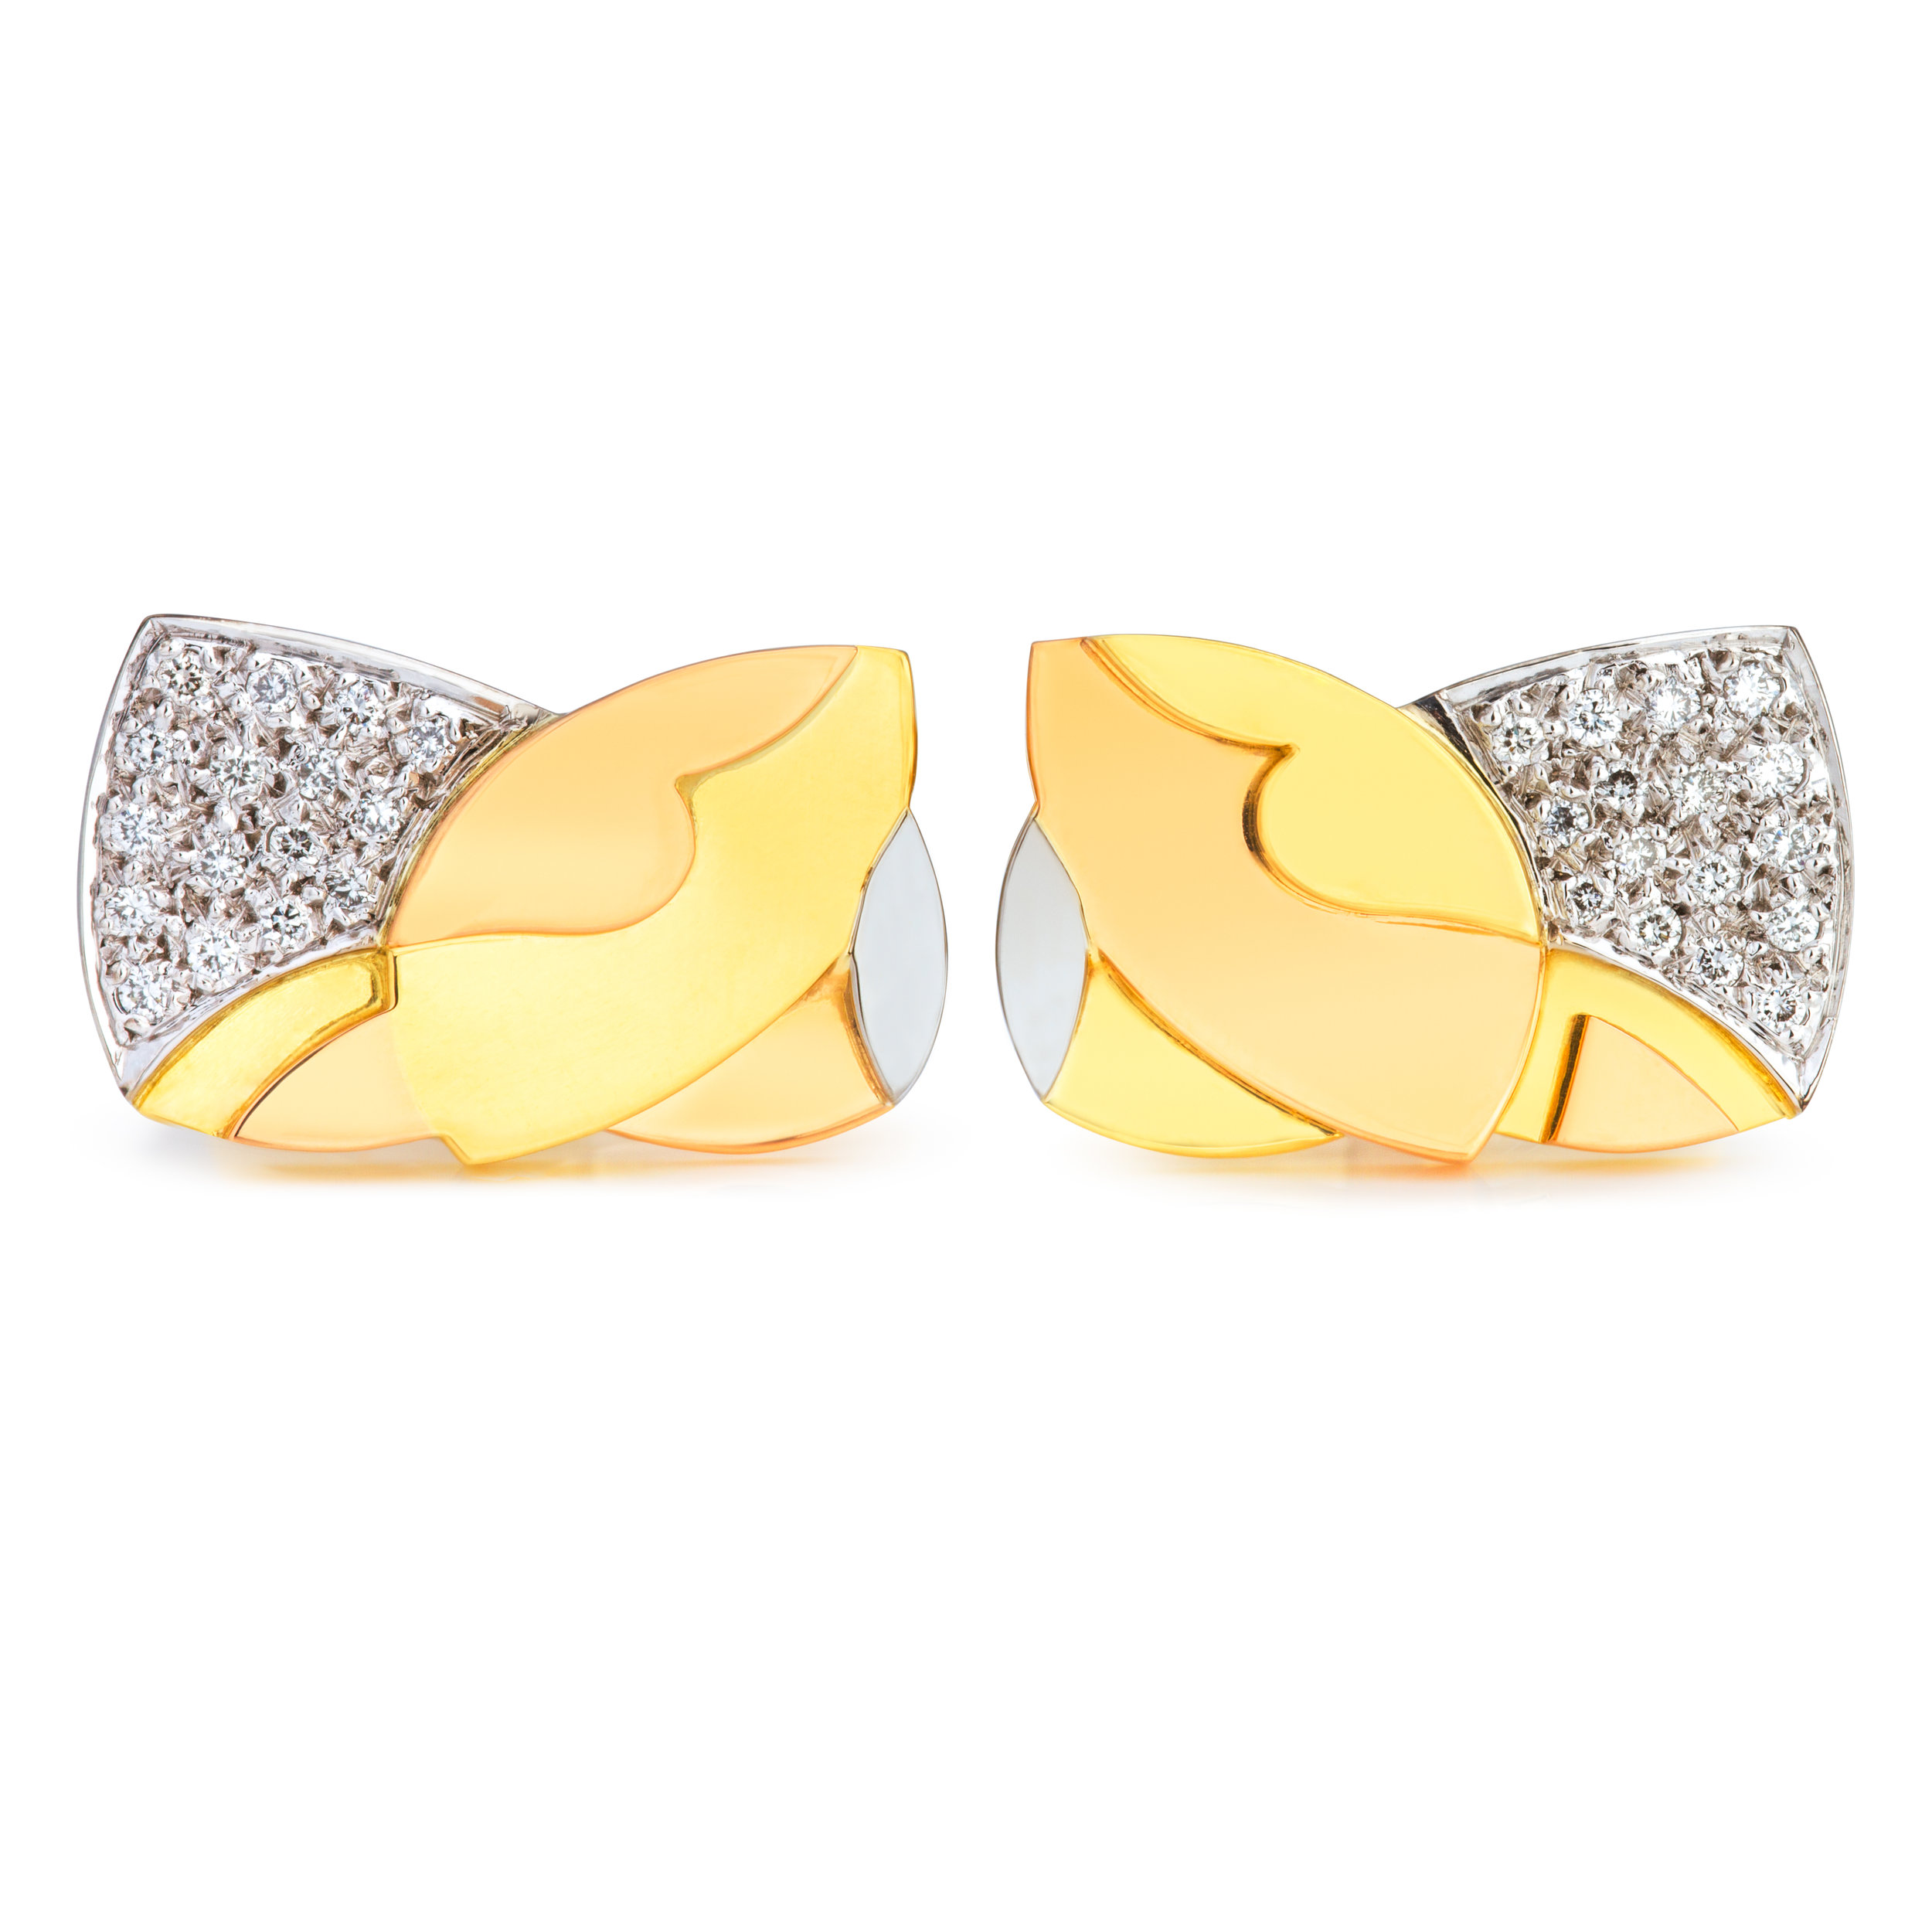 Bespoke 18ct yellow, rose,white gold and diamond cufflink commission